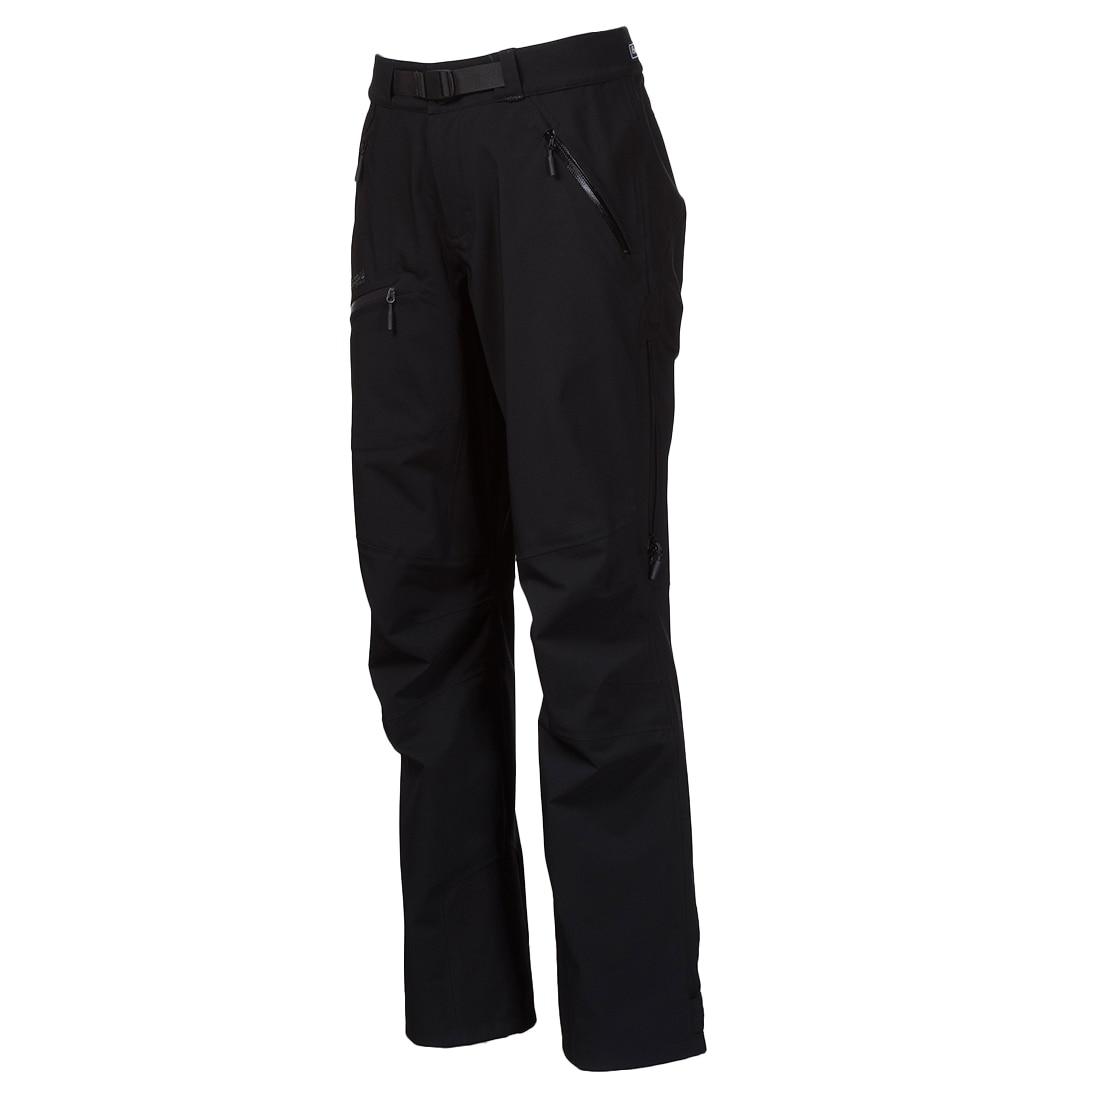 Breheimen 3L W Pants